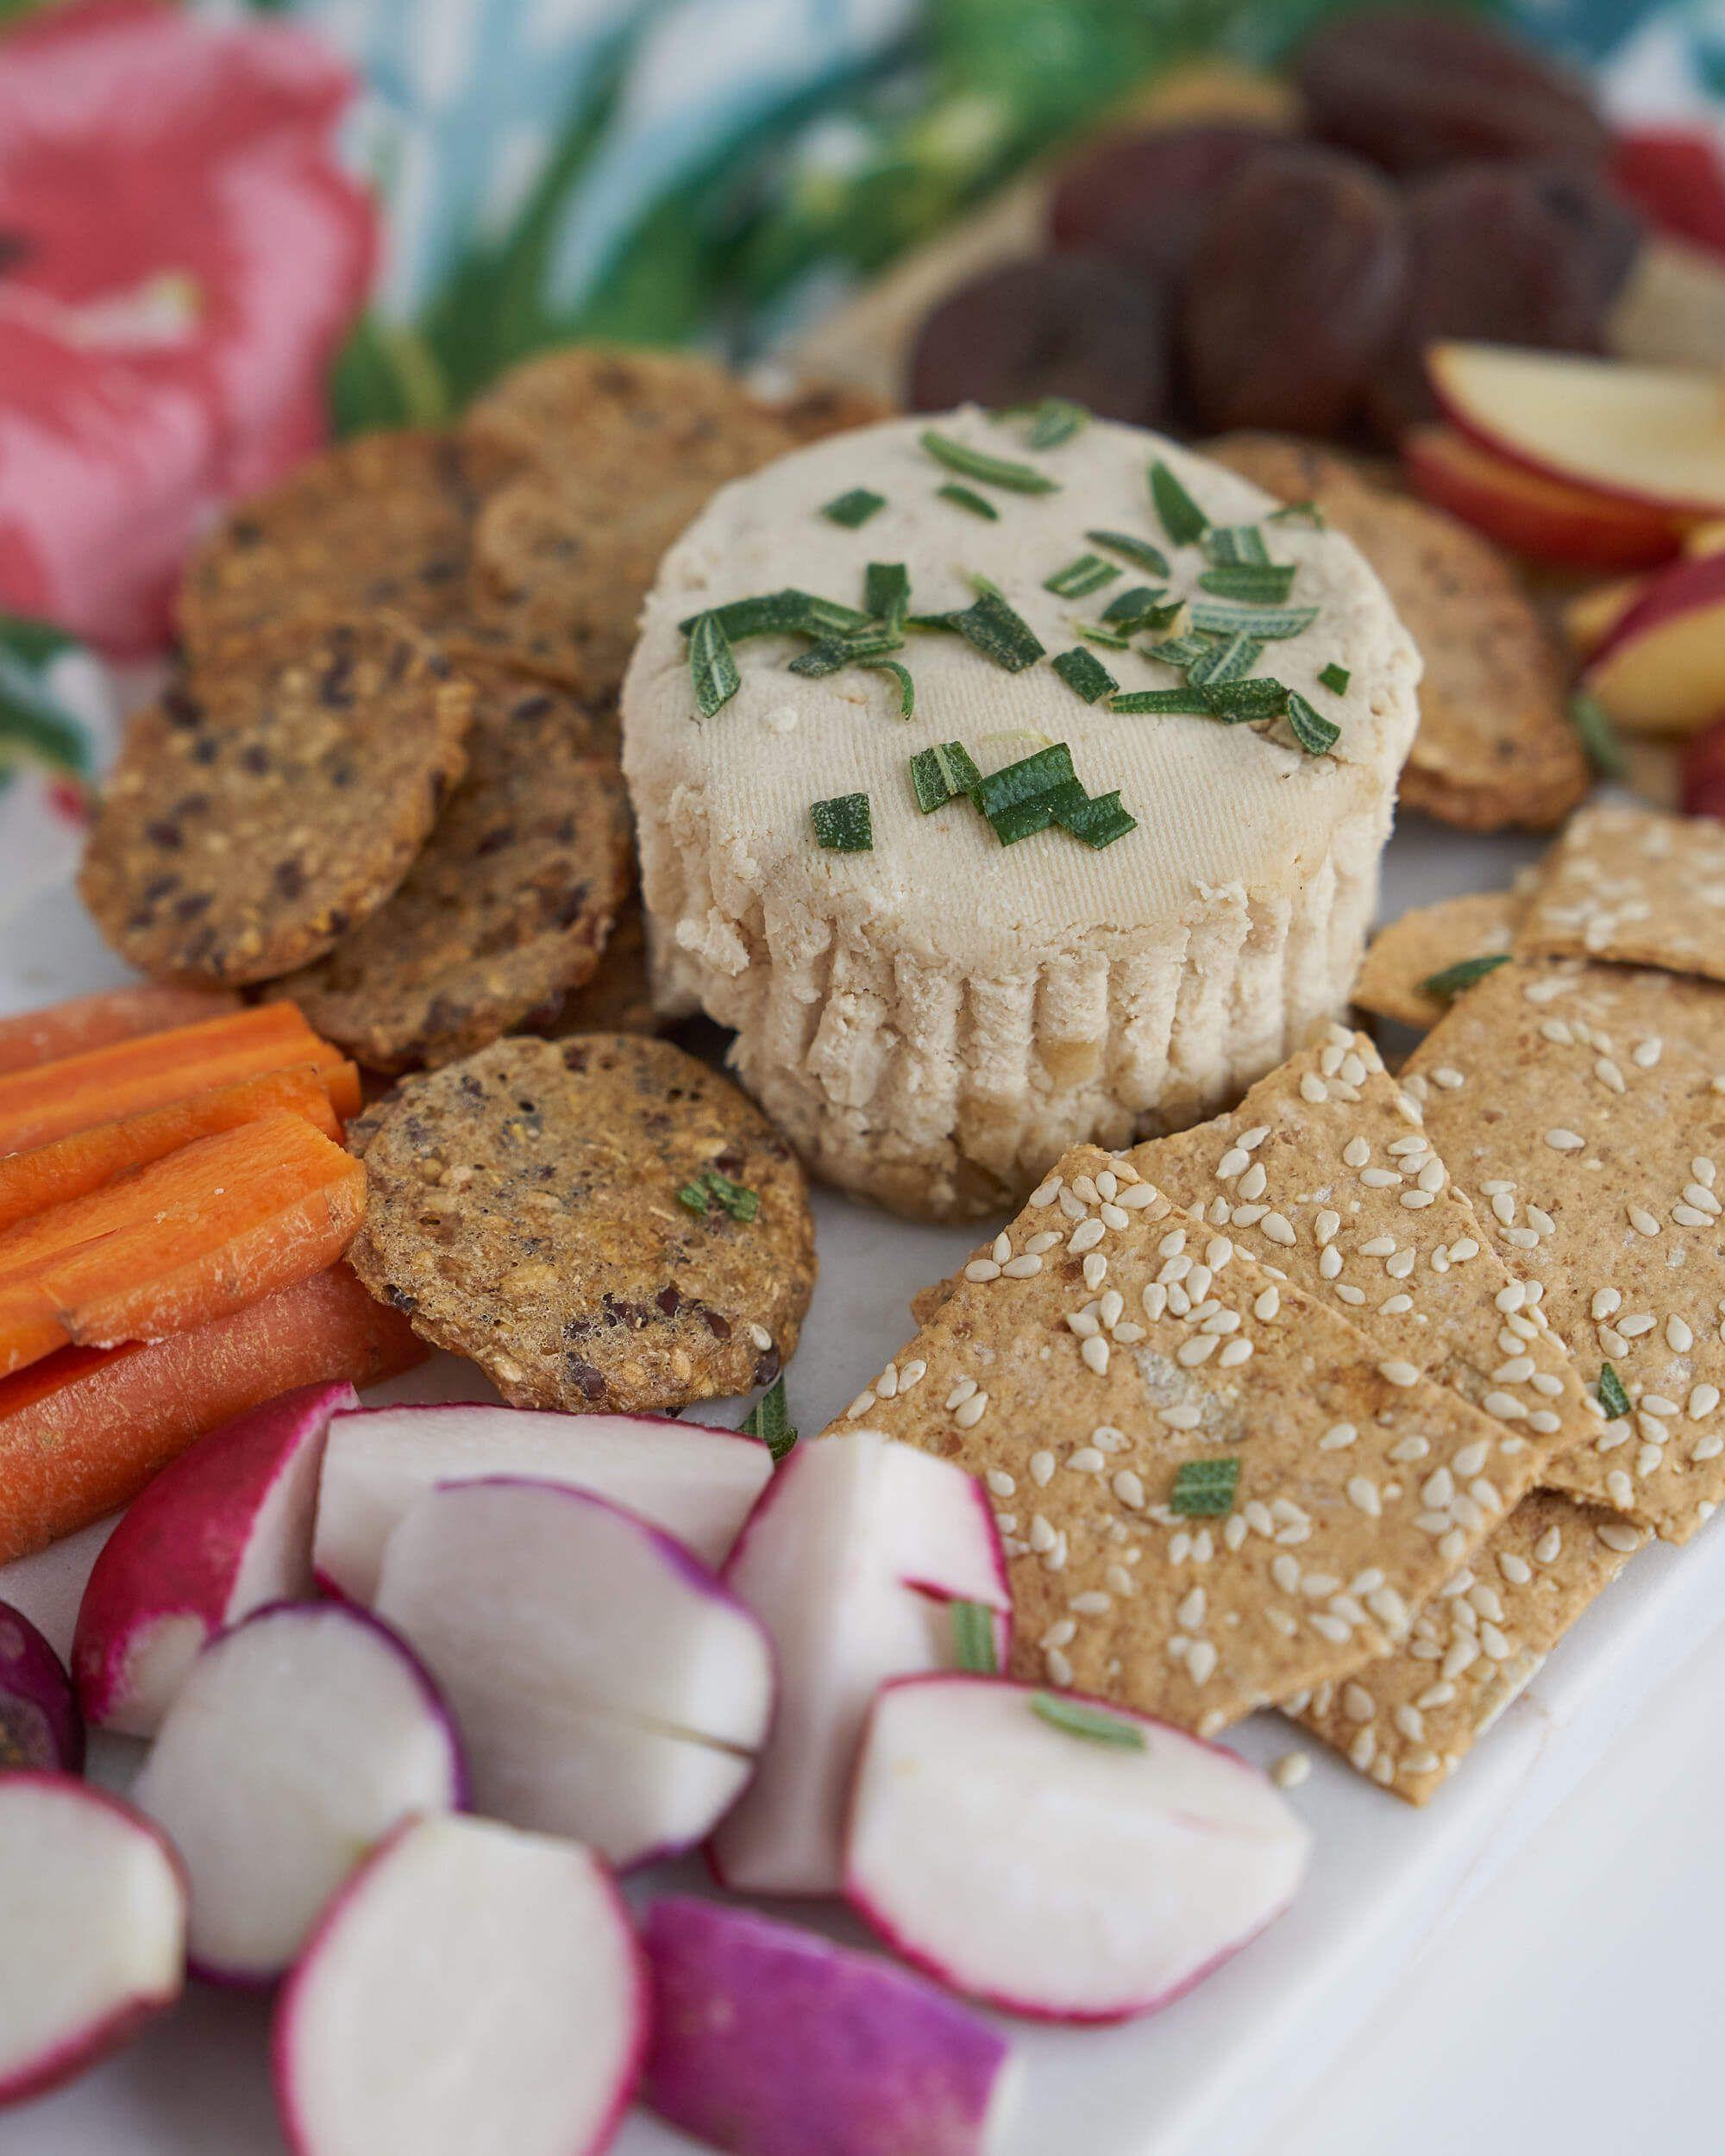 Homemade Creamy Cashew Cheese • Joyous Health